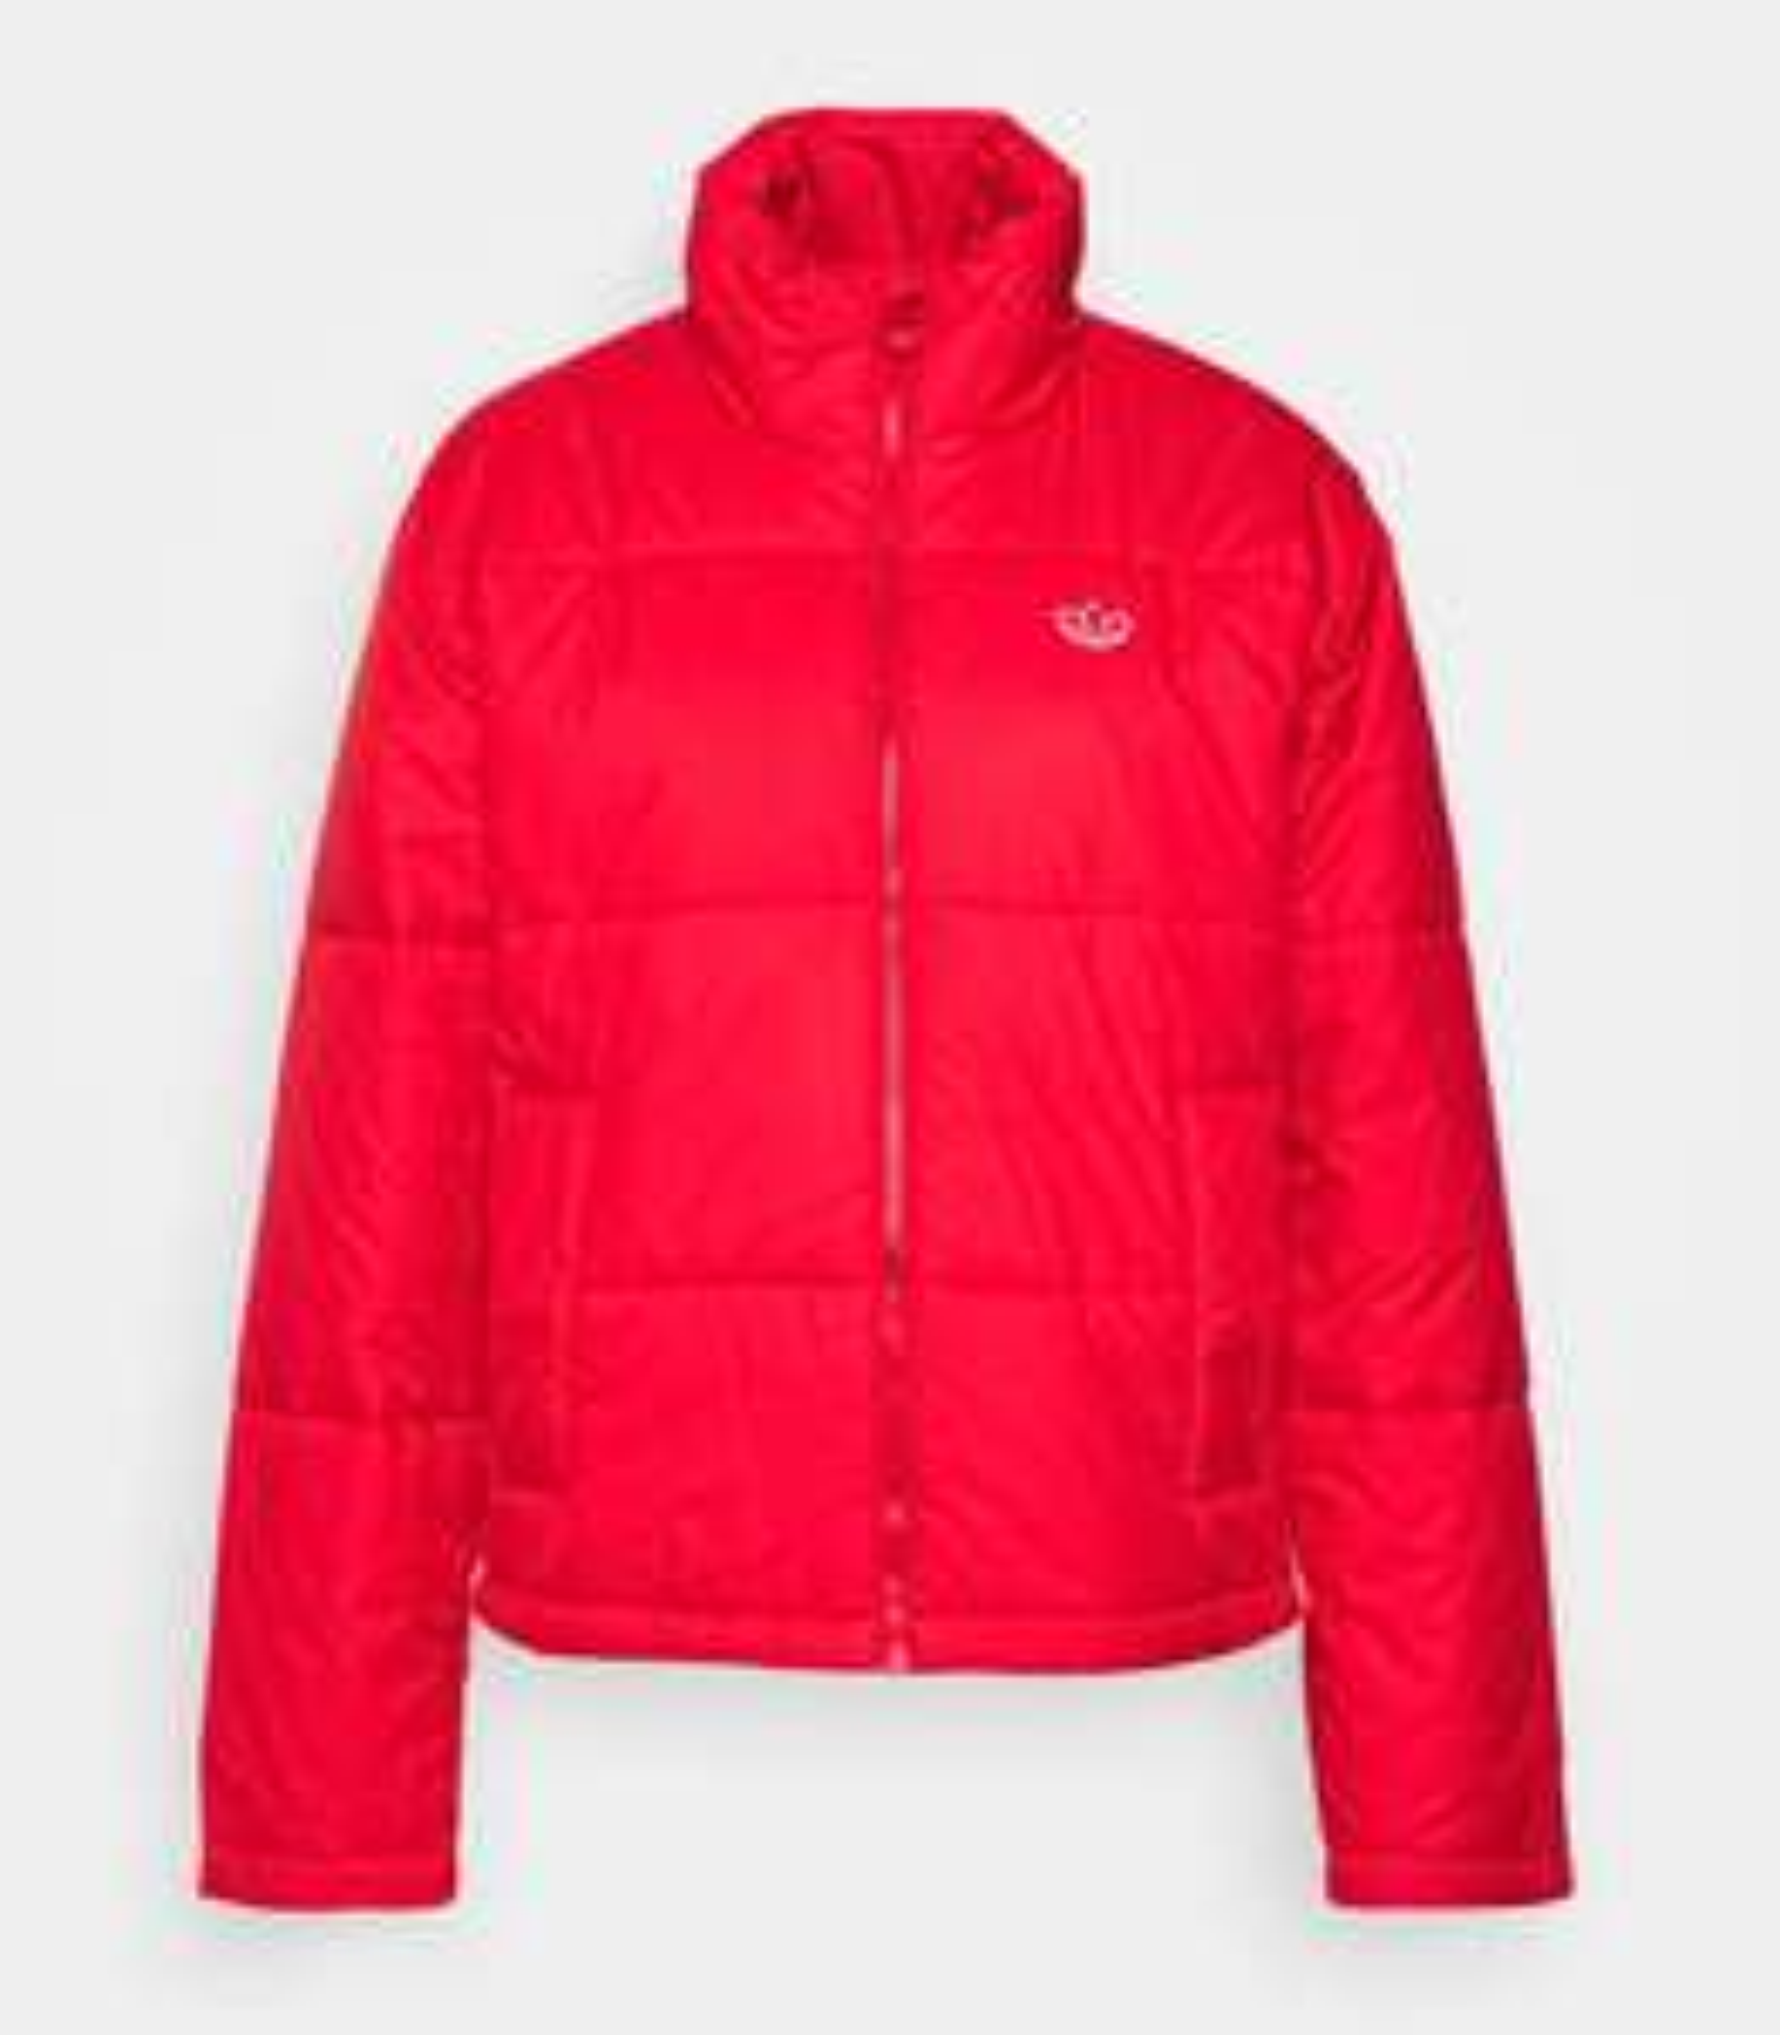 Adidas Originals - damska kurtka przejściowa - r. 30-46 @Zalando